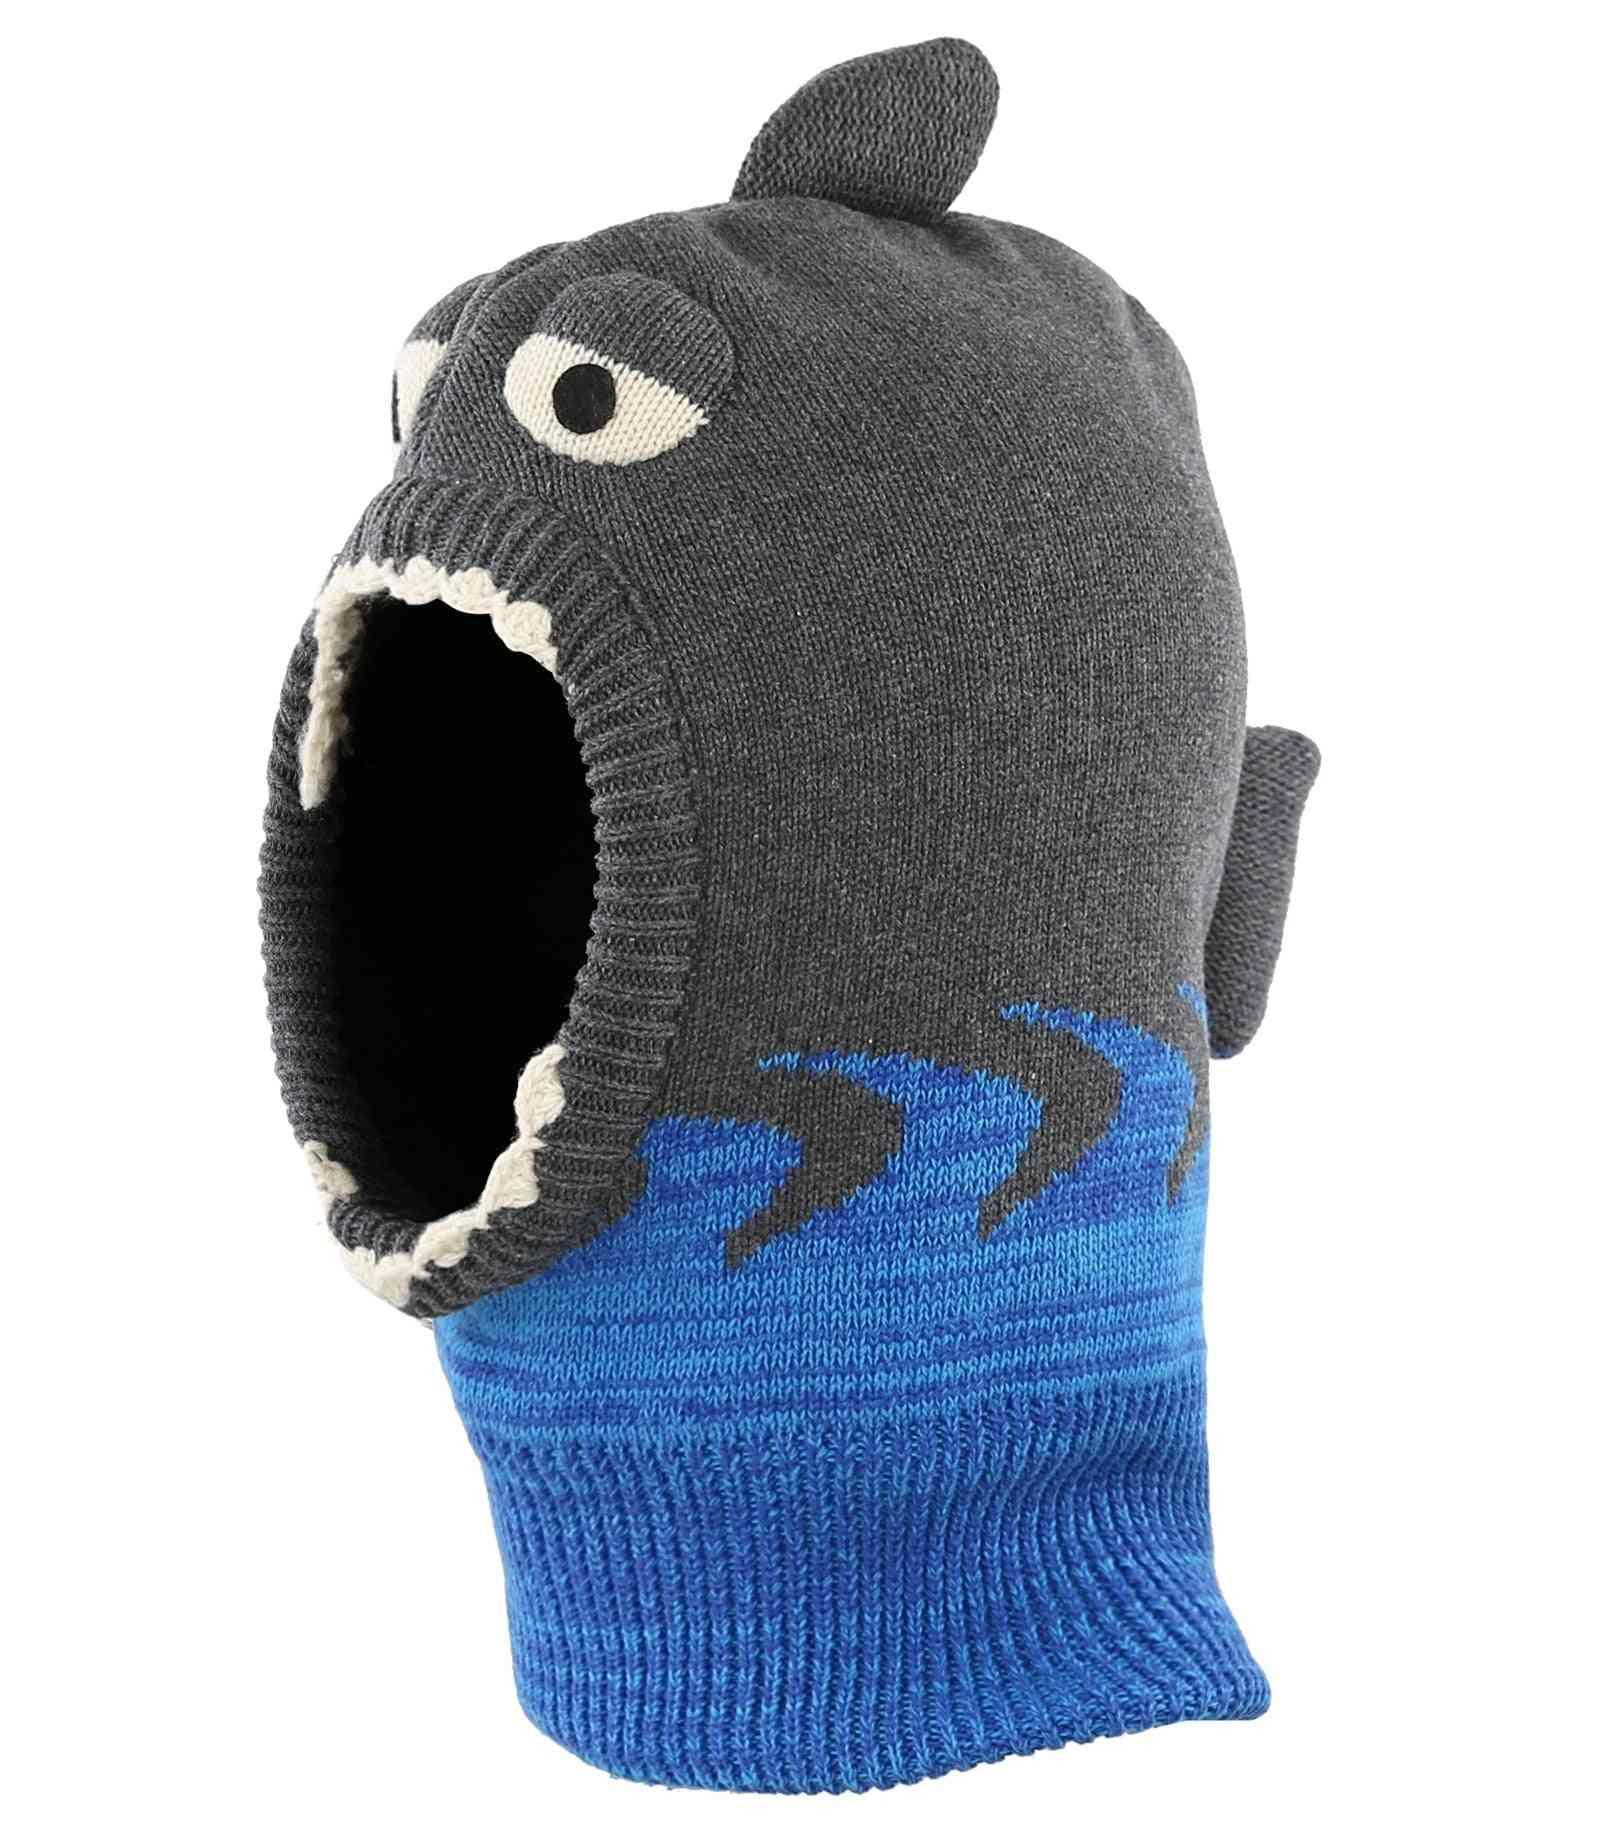 Toddler Infant Knit Winter Warm Hats, Cute Cartoon Shark Fleece Lined Hood Scarf